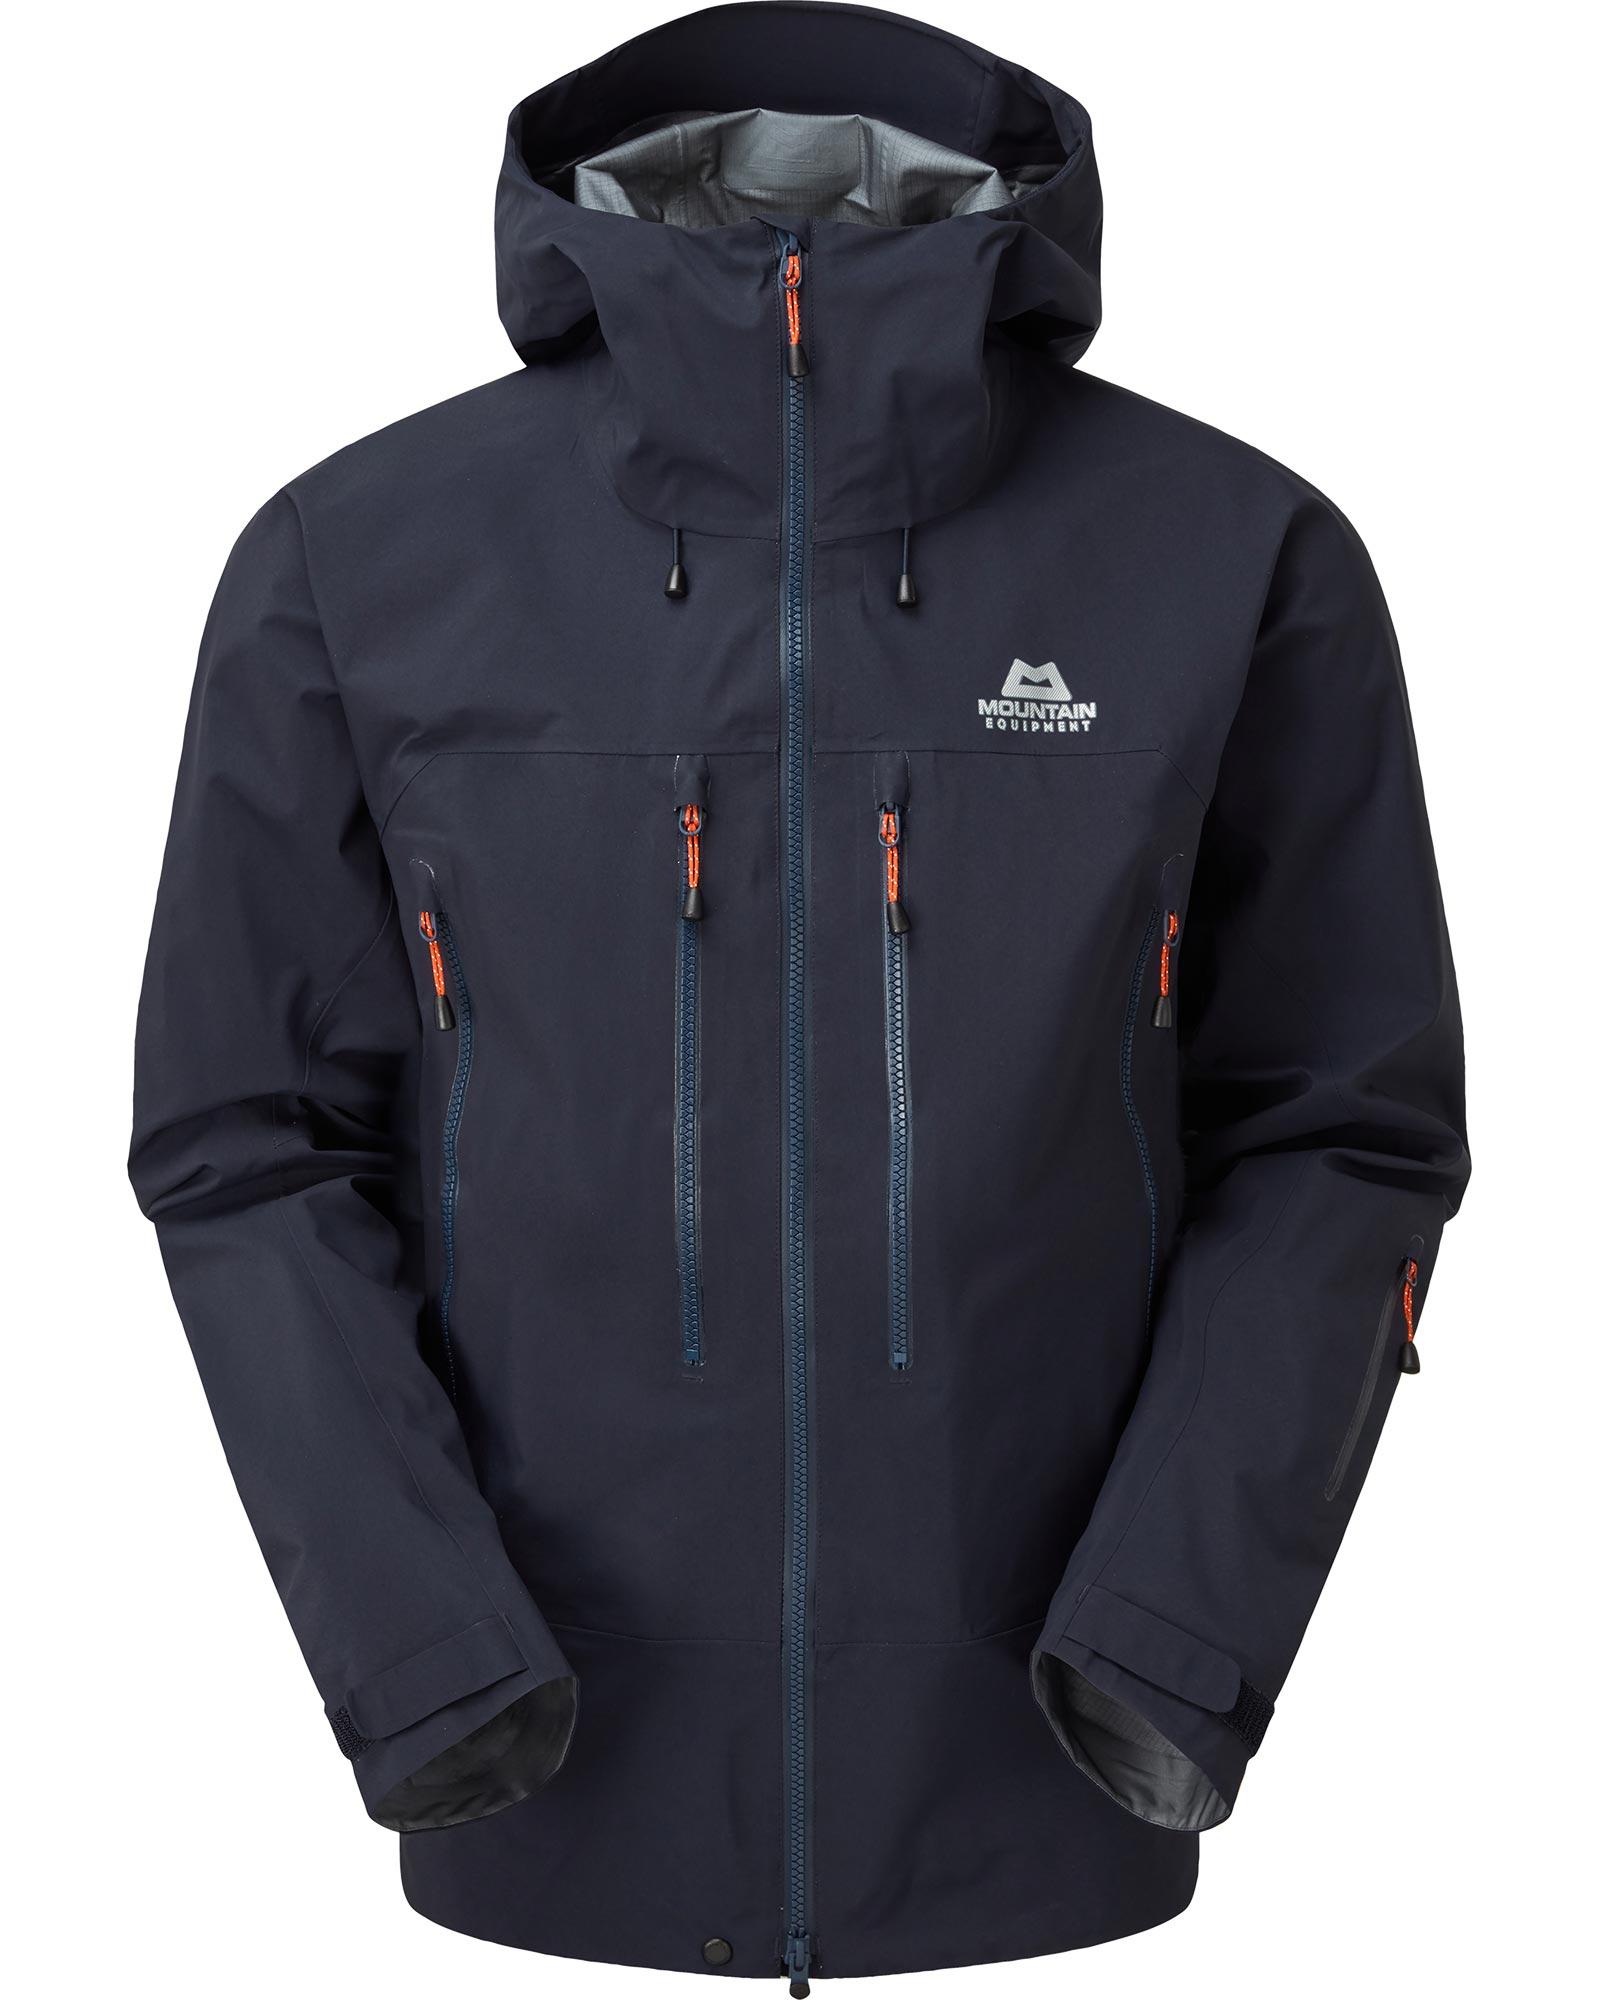 Mountain Equipment Changabang GORE-TEX Pro Men's Jacket 0